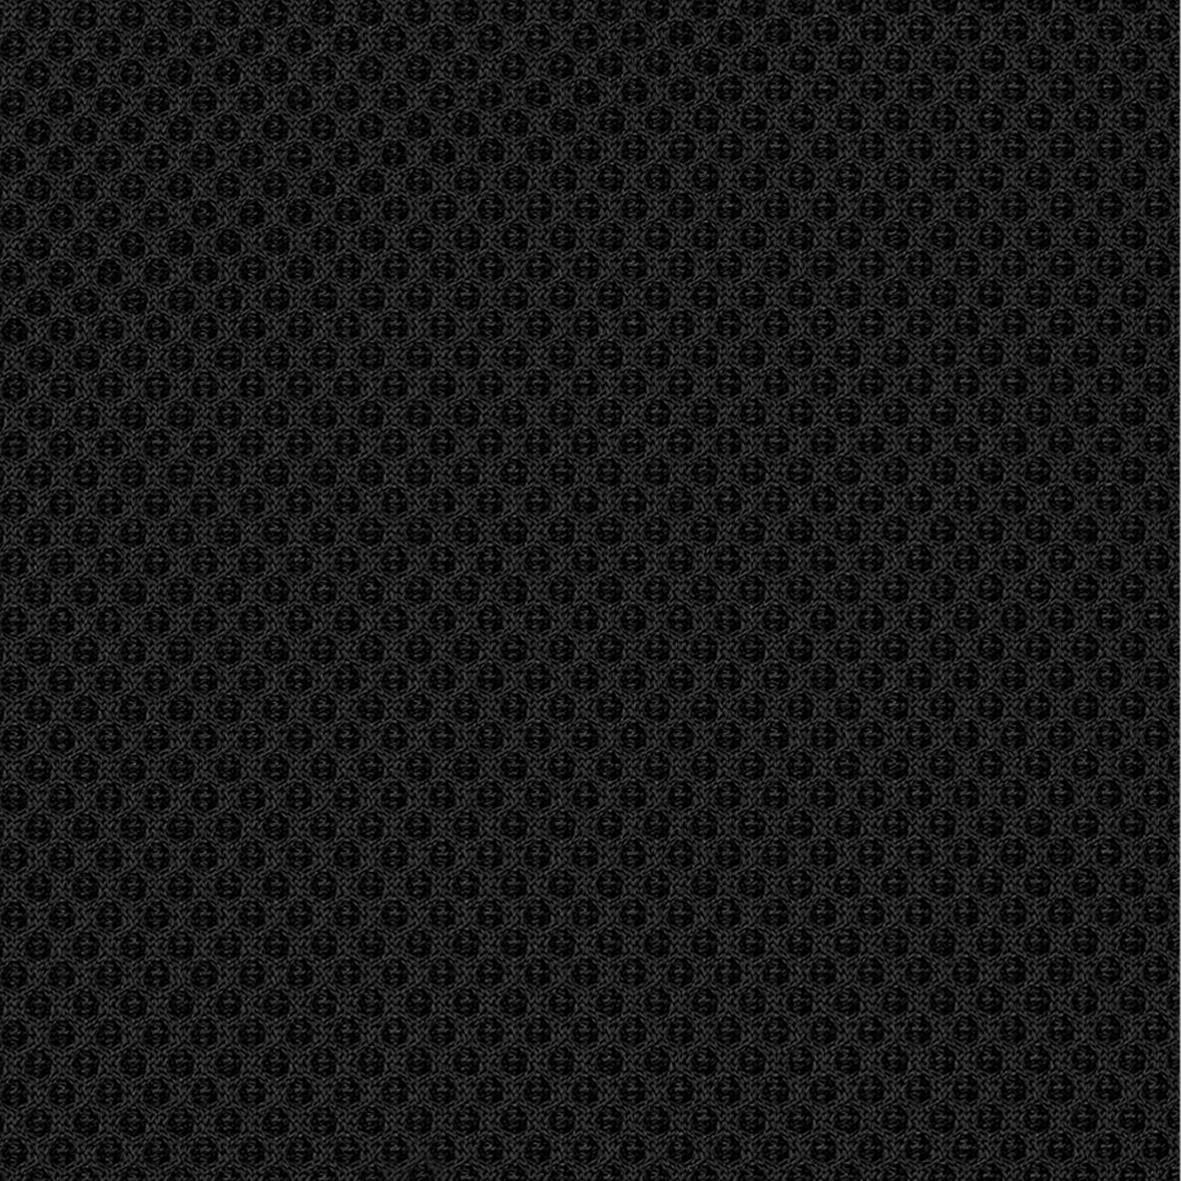 RR01 Black